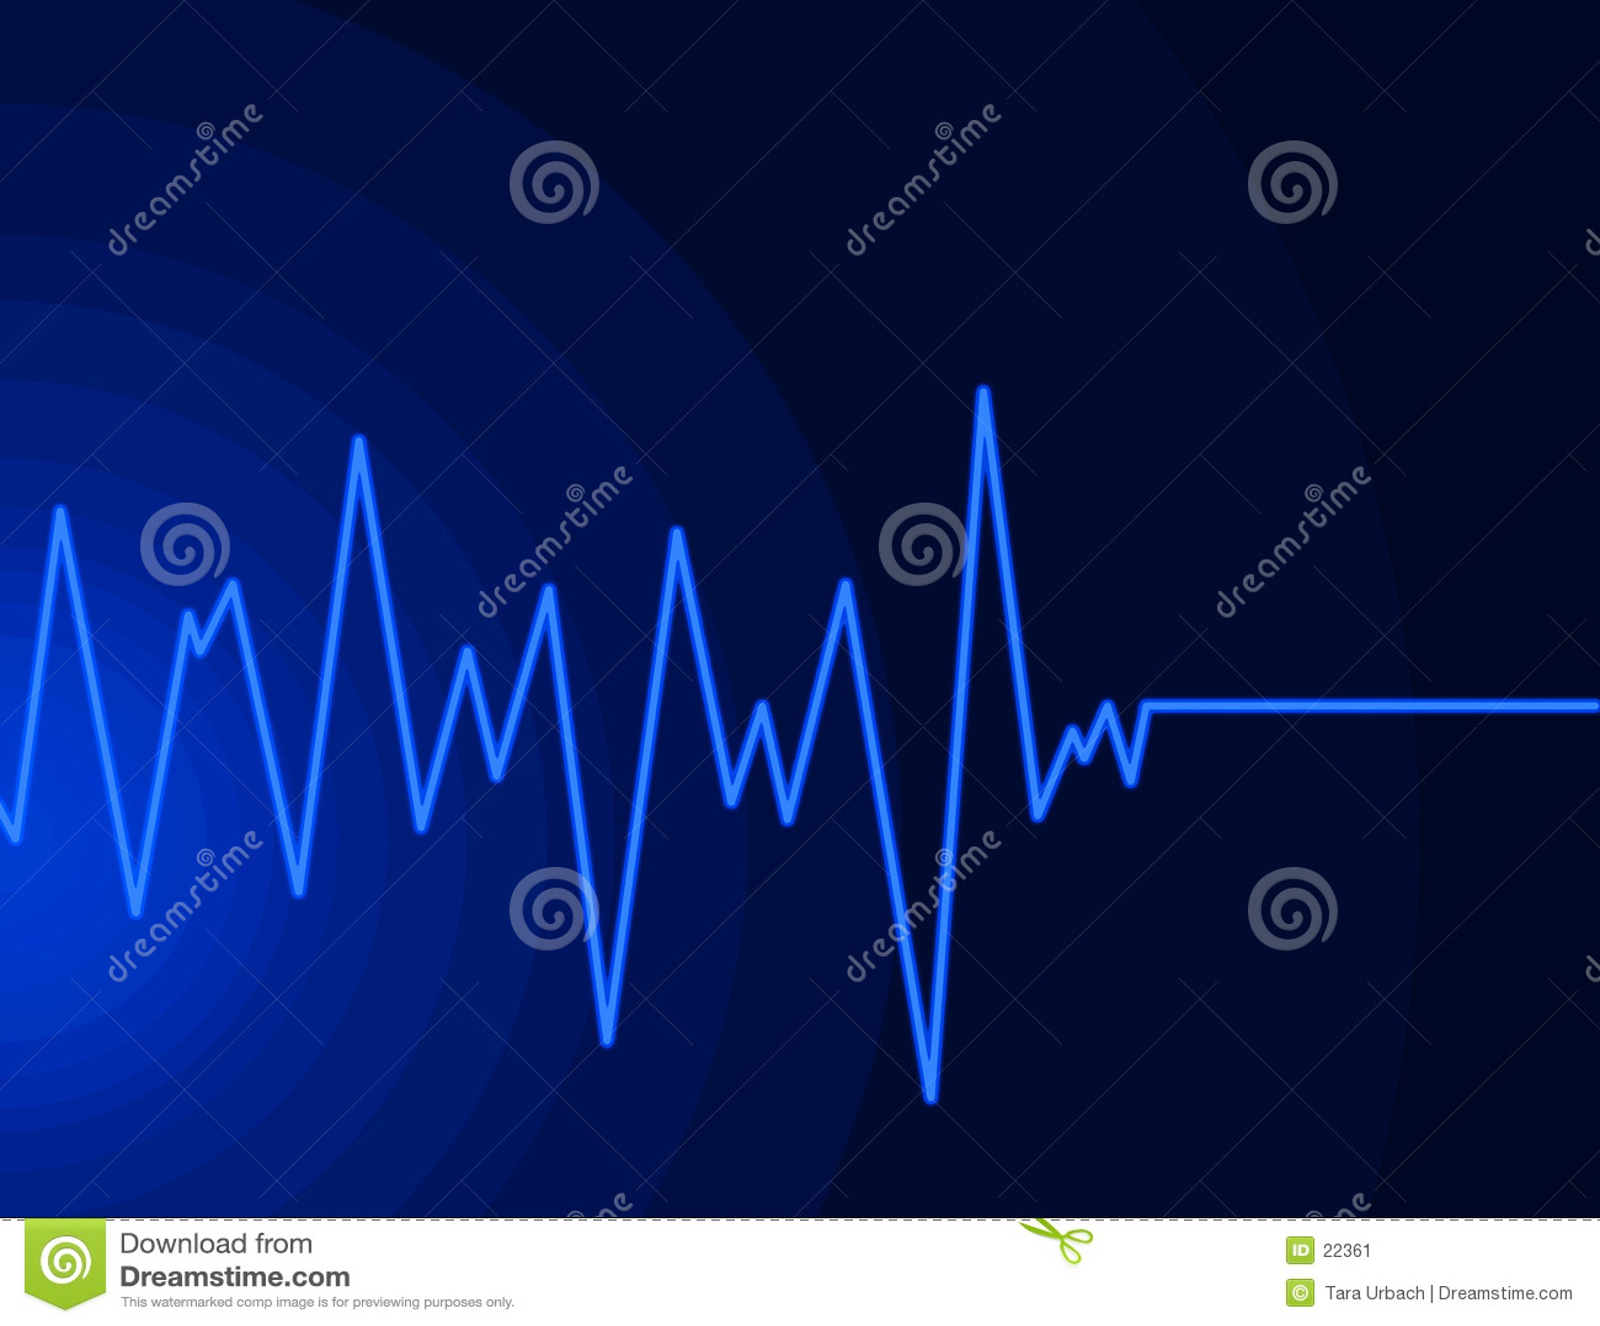 Onda radio - azzurro al neon